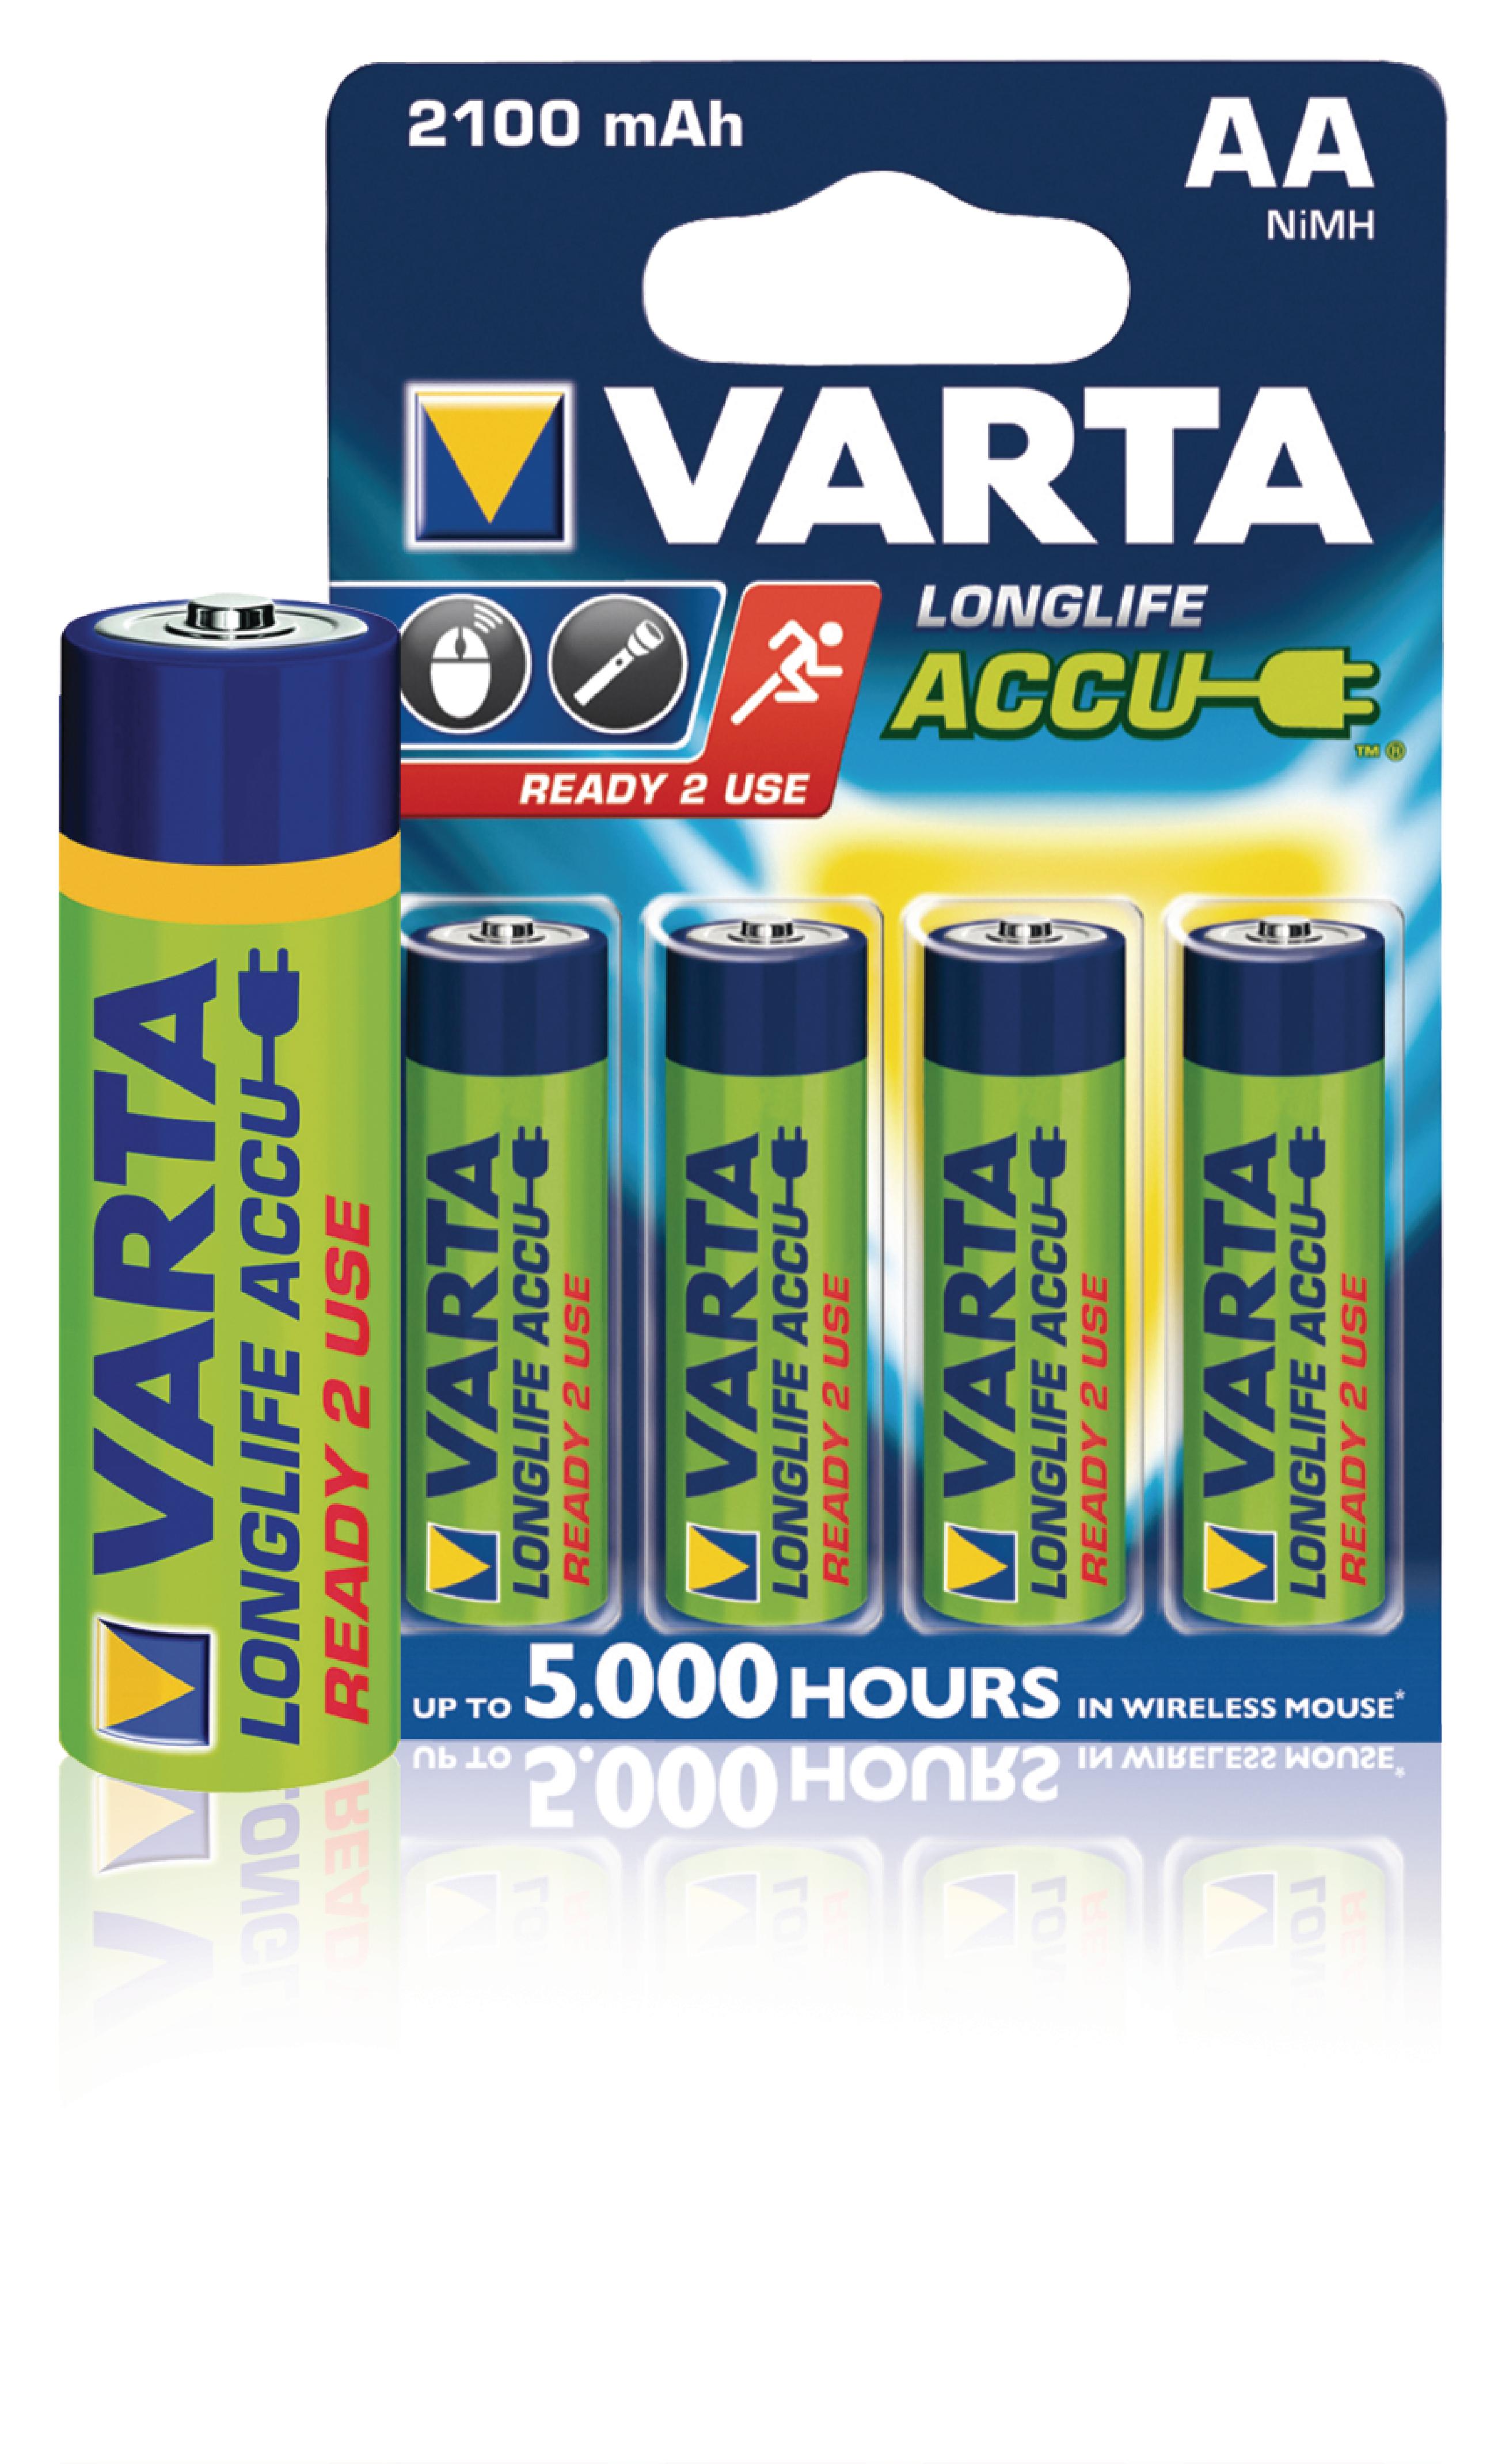 VARTA-56706B - Varta - Rechargeable NiMH Battery AA 1.2 V